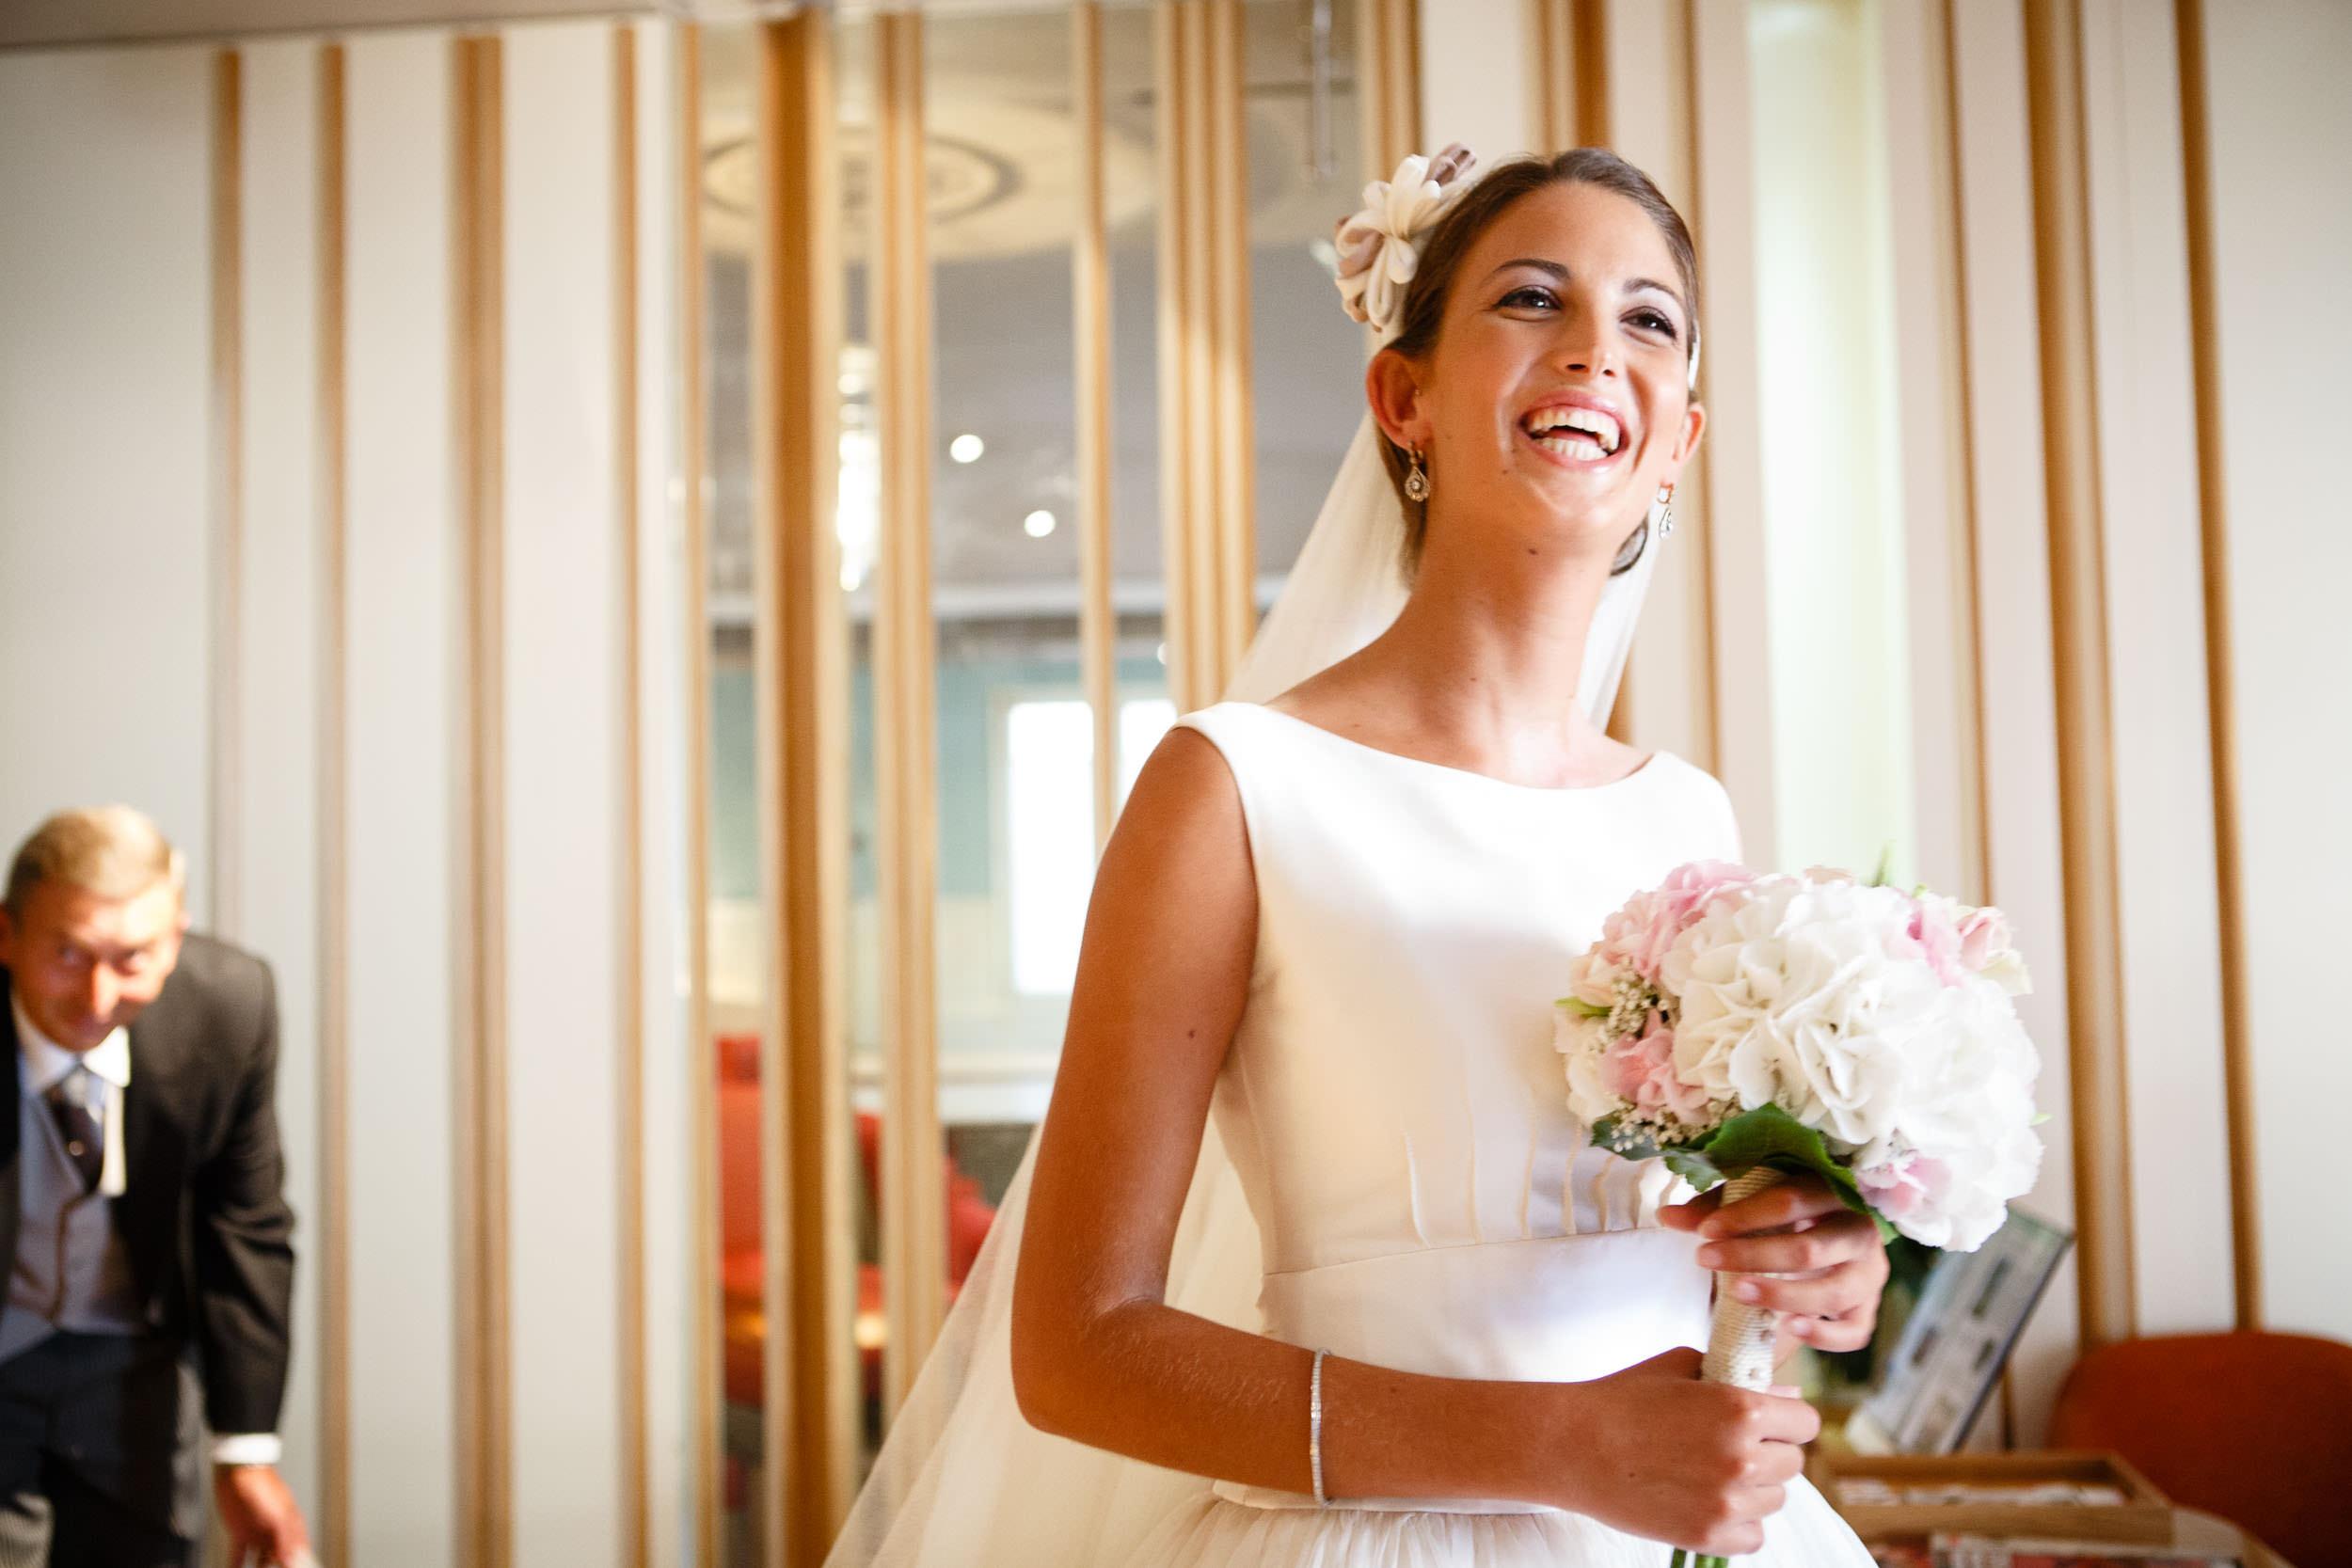 Wedding Photographer La Rioja Basque Country Spain - James Sturcke - sturcke.org_001.jpg